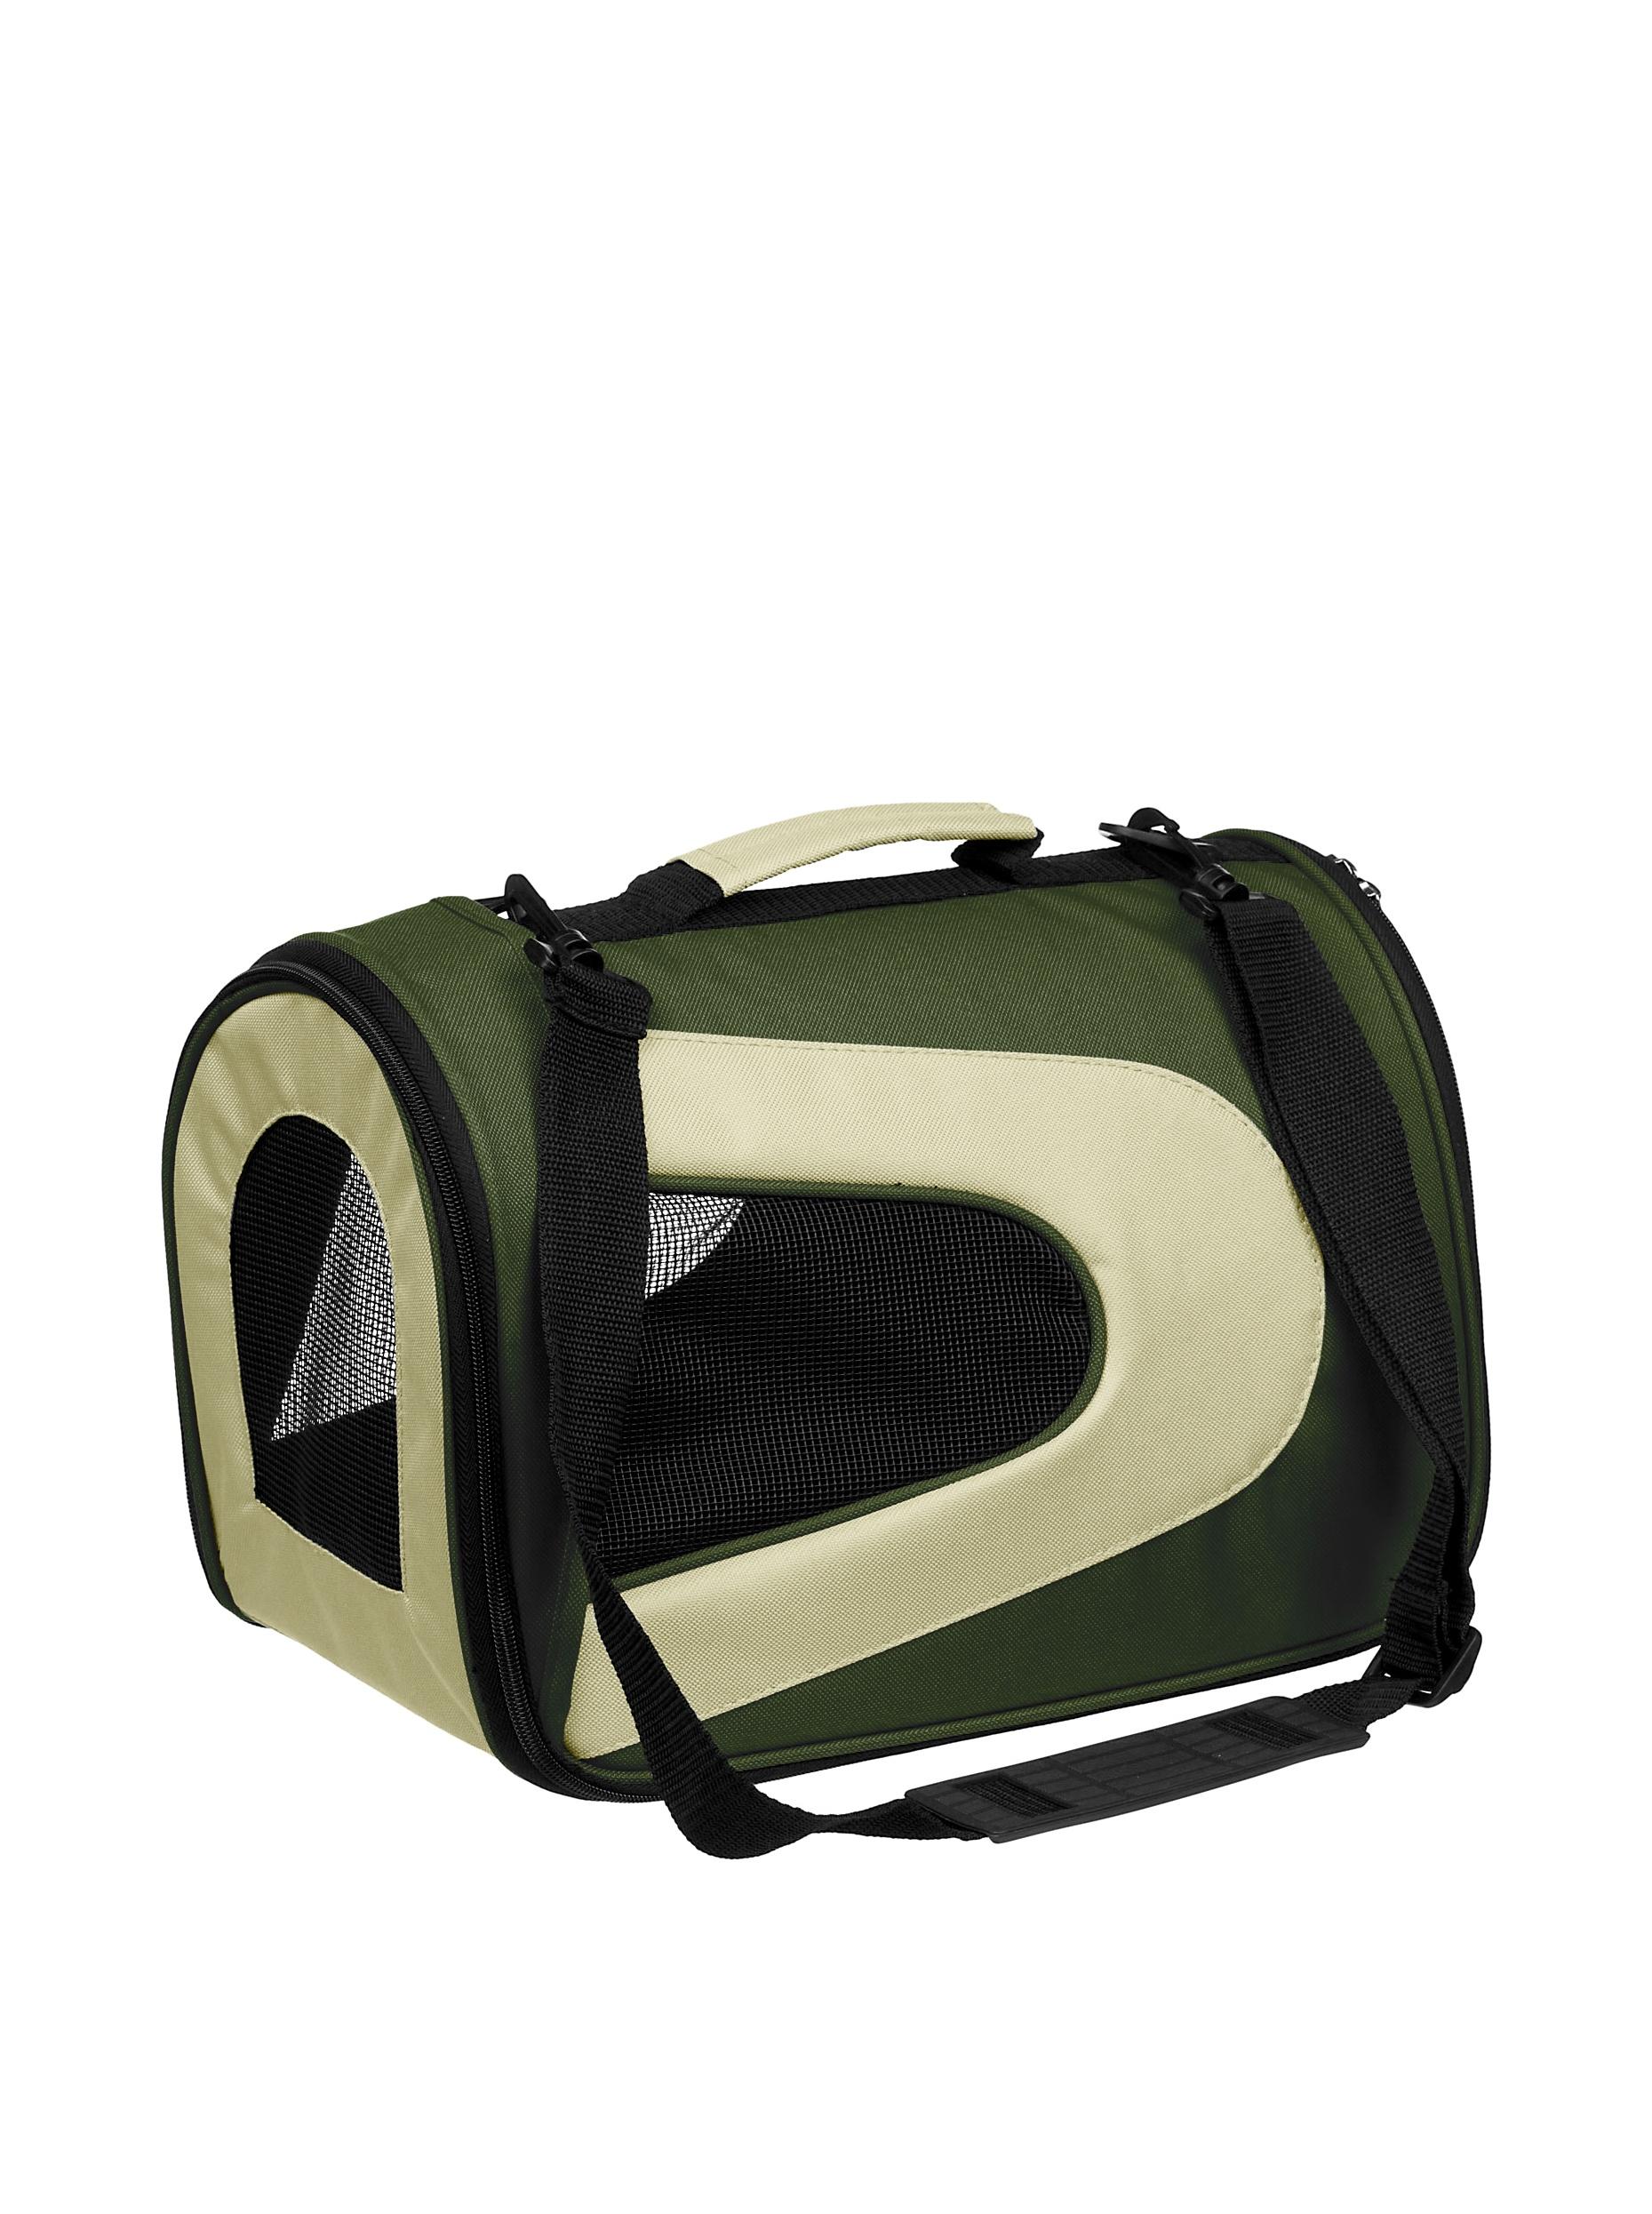 Pet Life Sporty Mesh Carrier (Green/Khaki)